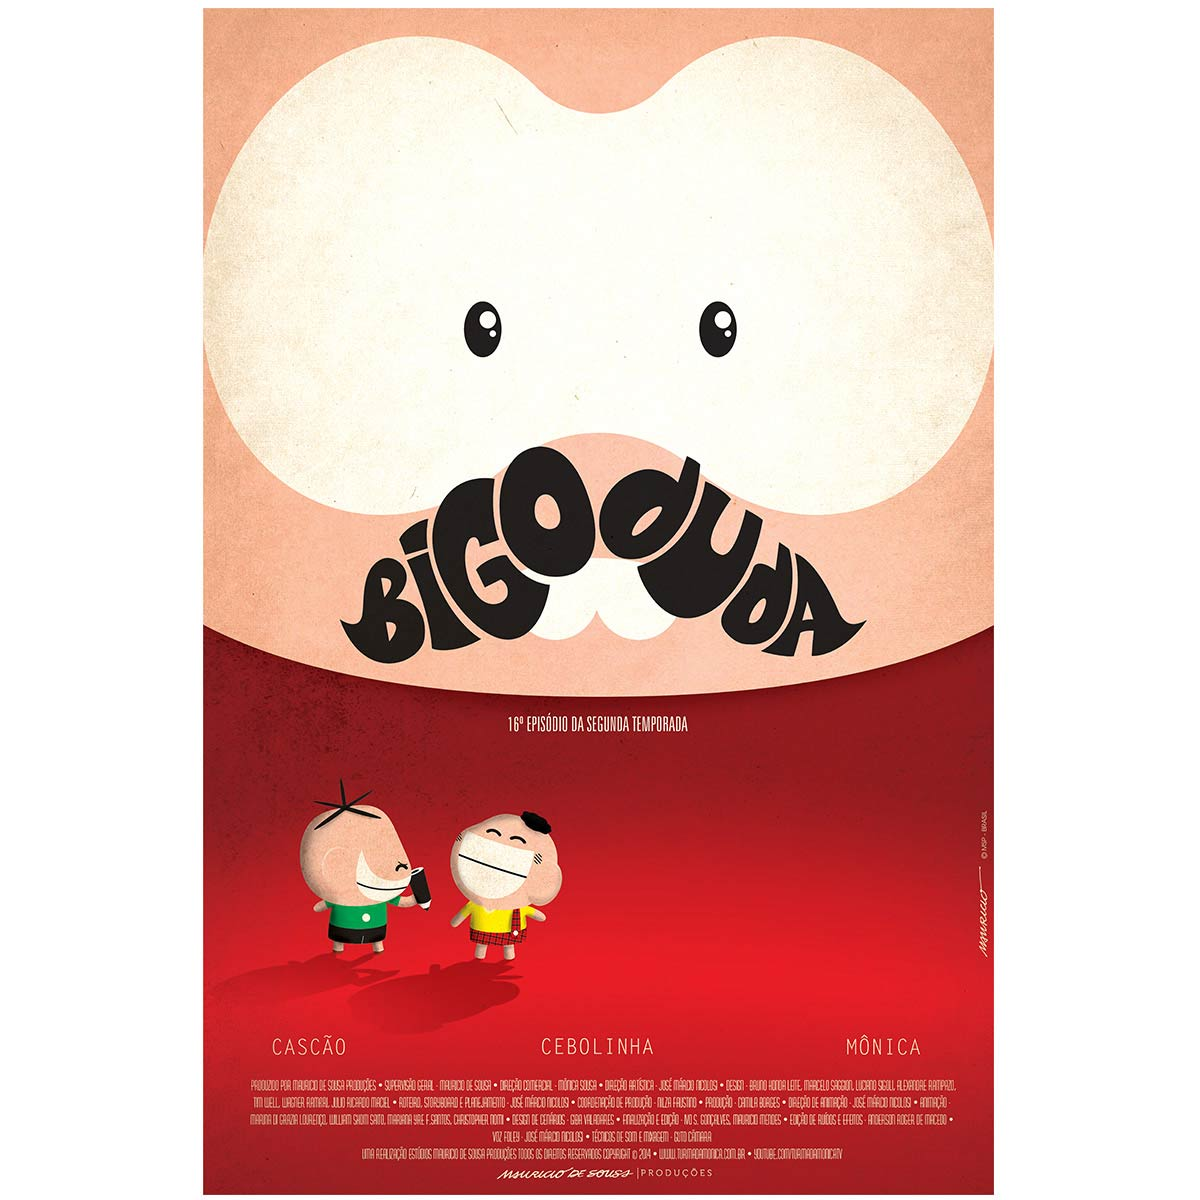 Poster Turma da Mônica Toy Bigoduda